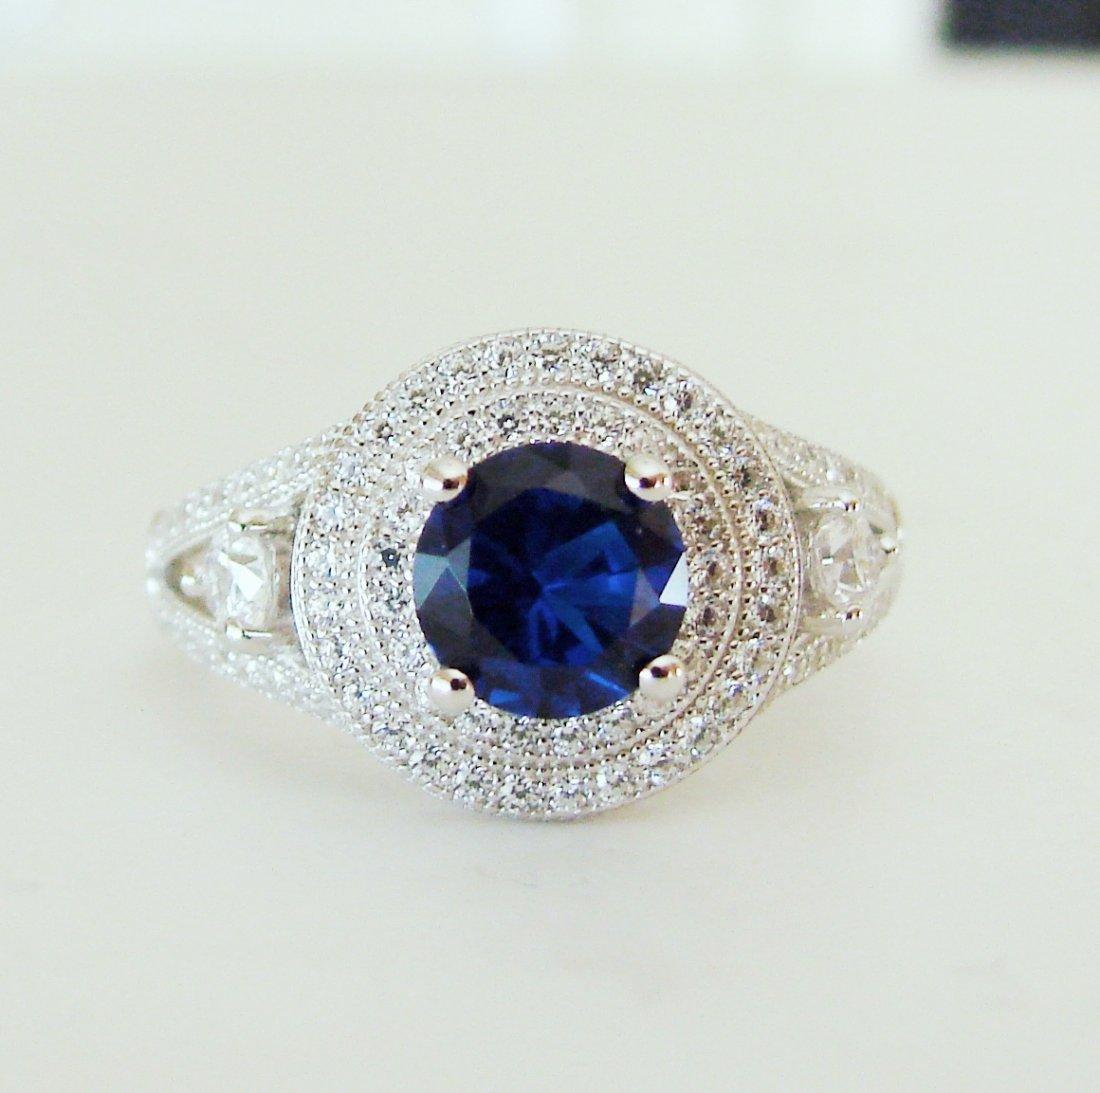 Creation Diamond-Sapphire Ring 2.10Ct 18k W/g Overlay